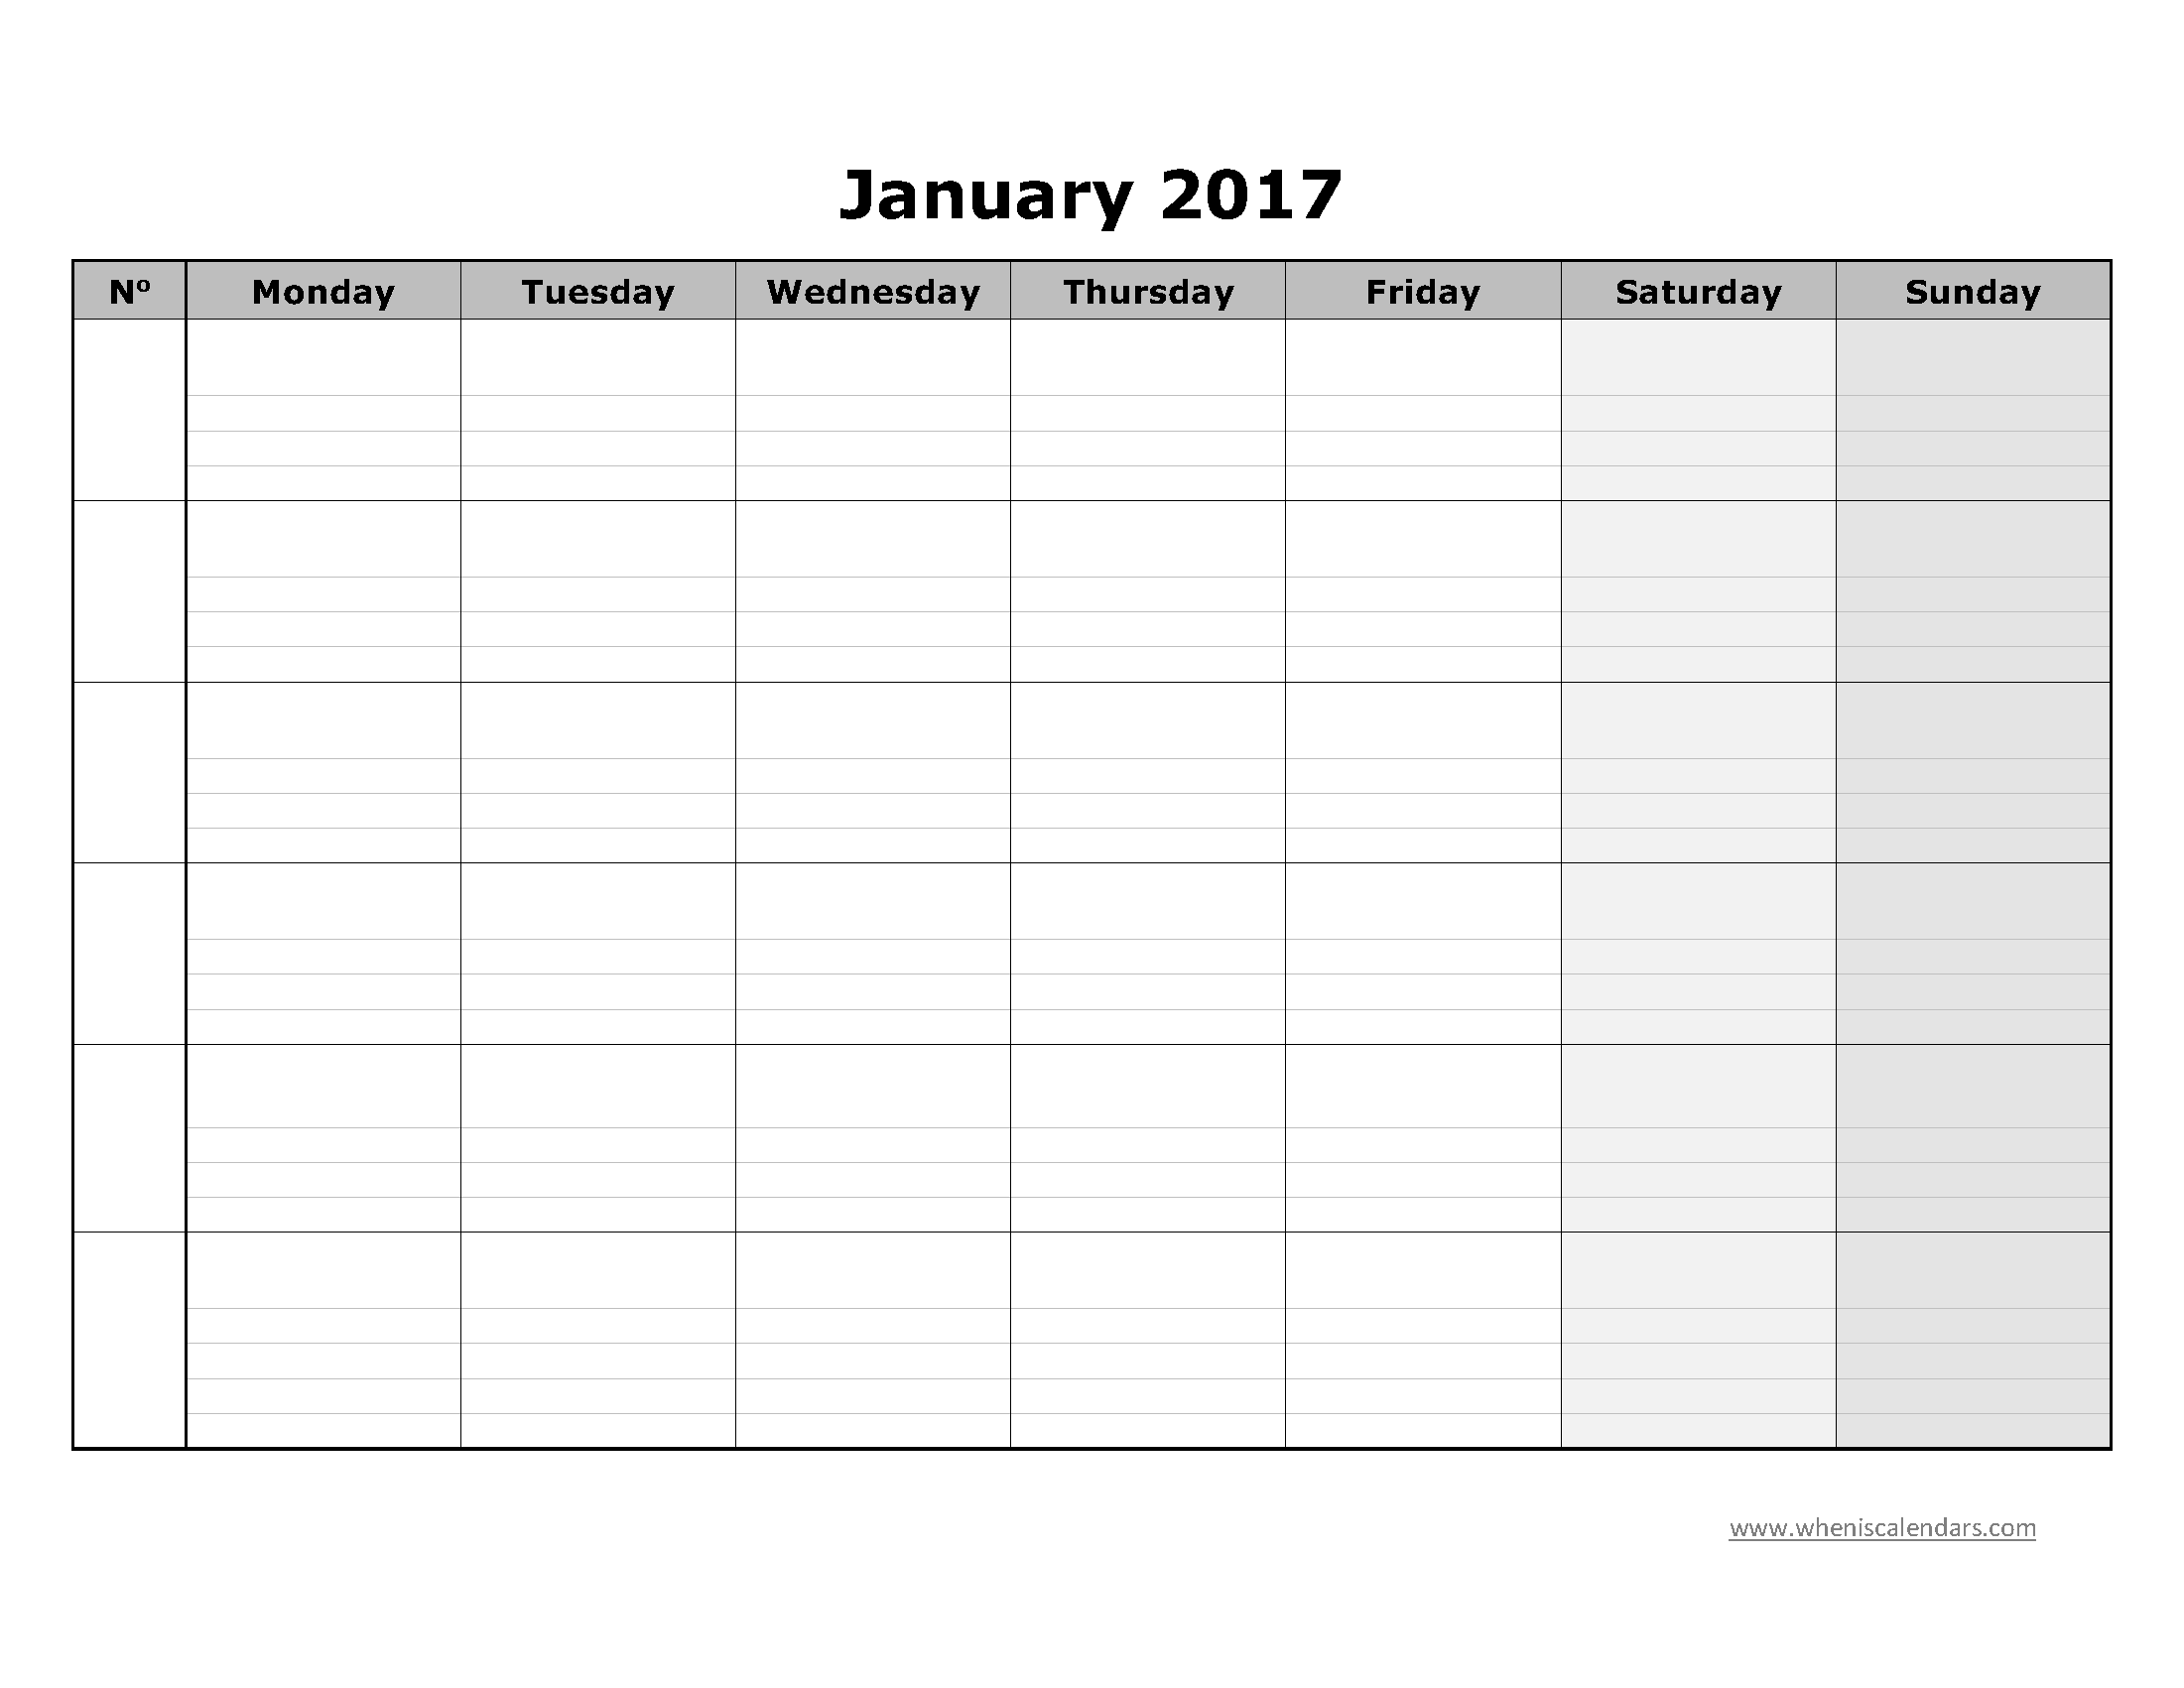 blank january 2017 calendar templates printable pdf. Black Bedroom Furniture Sets. Home Design Ideas